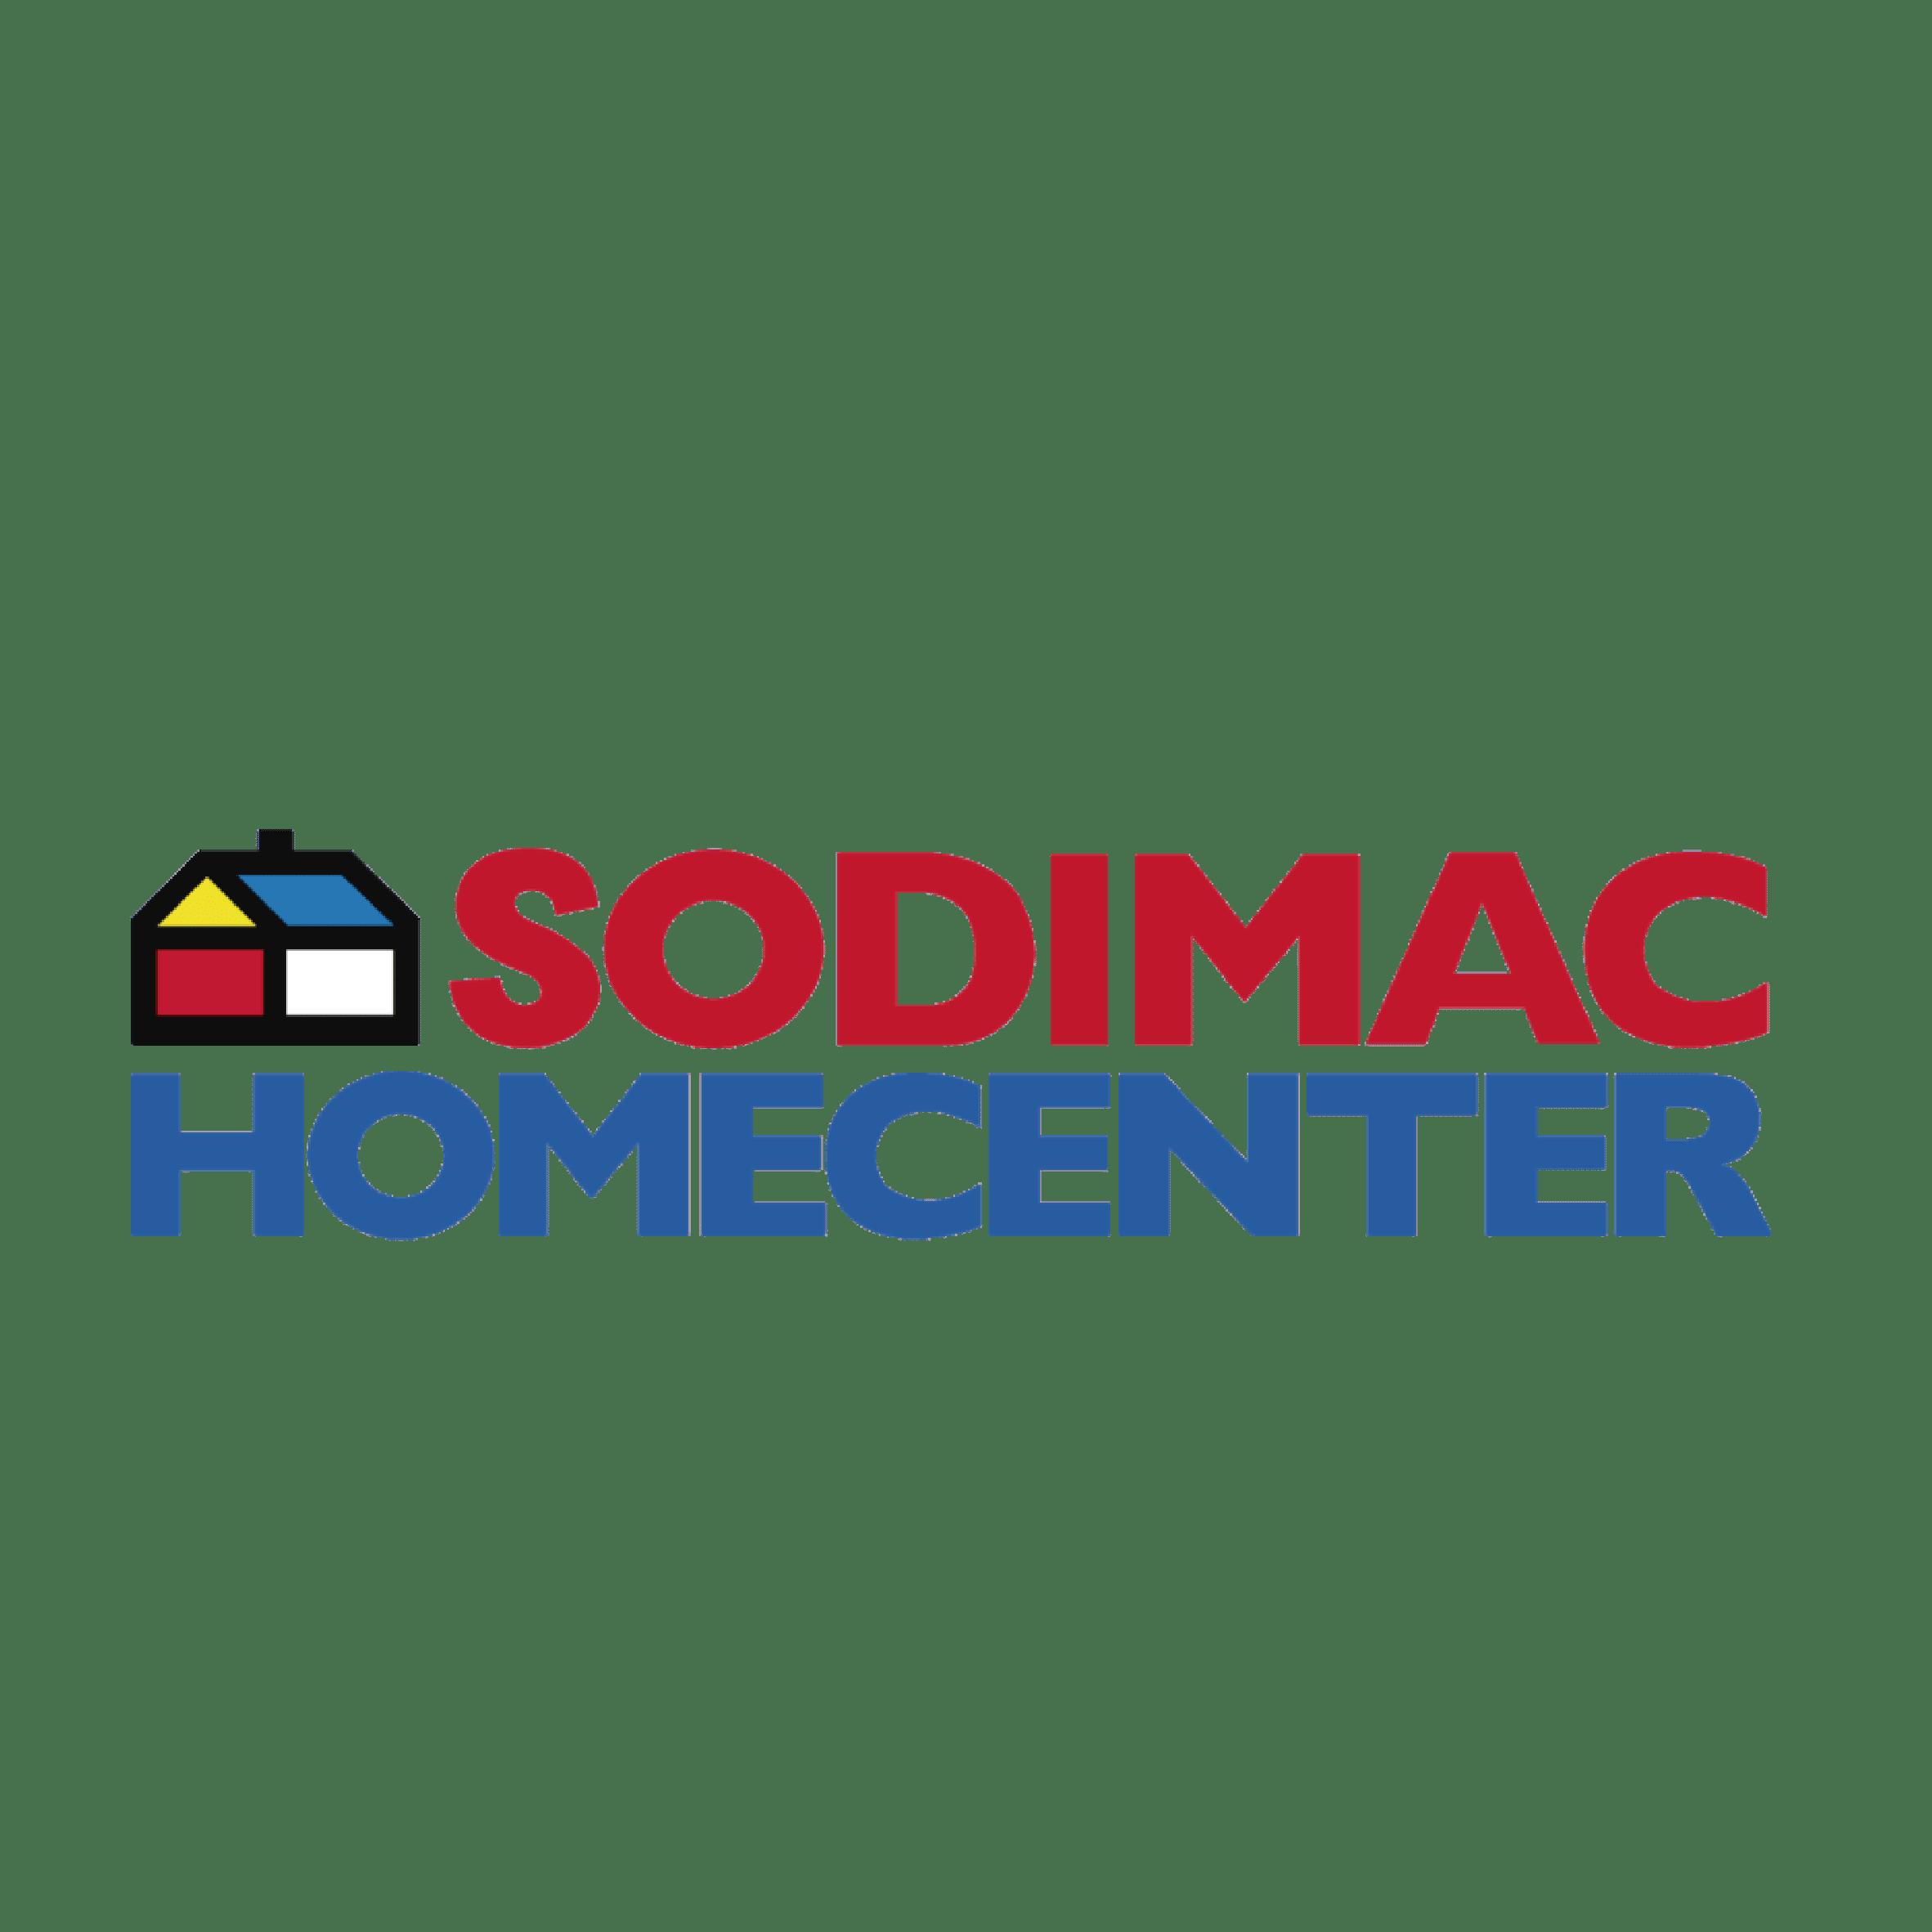 Responsabilidad Ambiental- Homecenter Sodimac